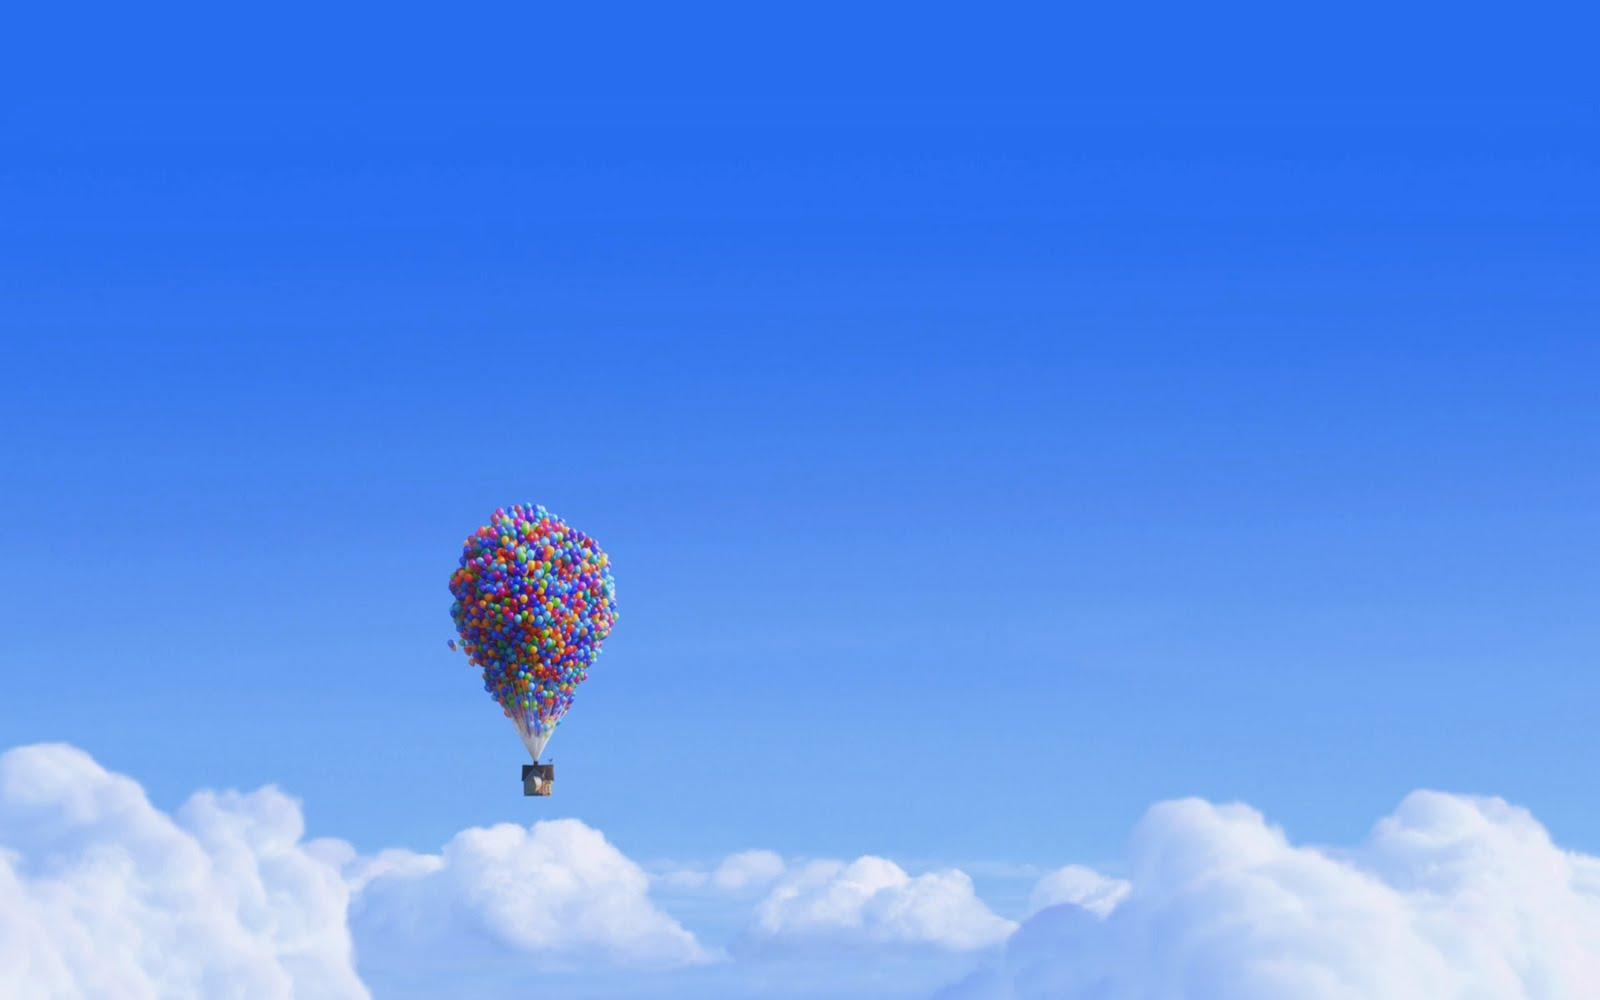 UP 3D Movie Pixar Studios HD WallpapersHigh Resolution Backgrounds 1600x1000